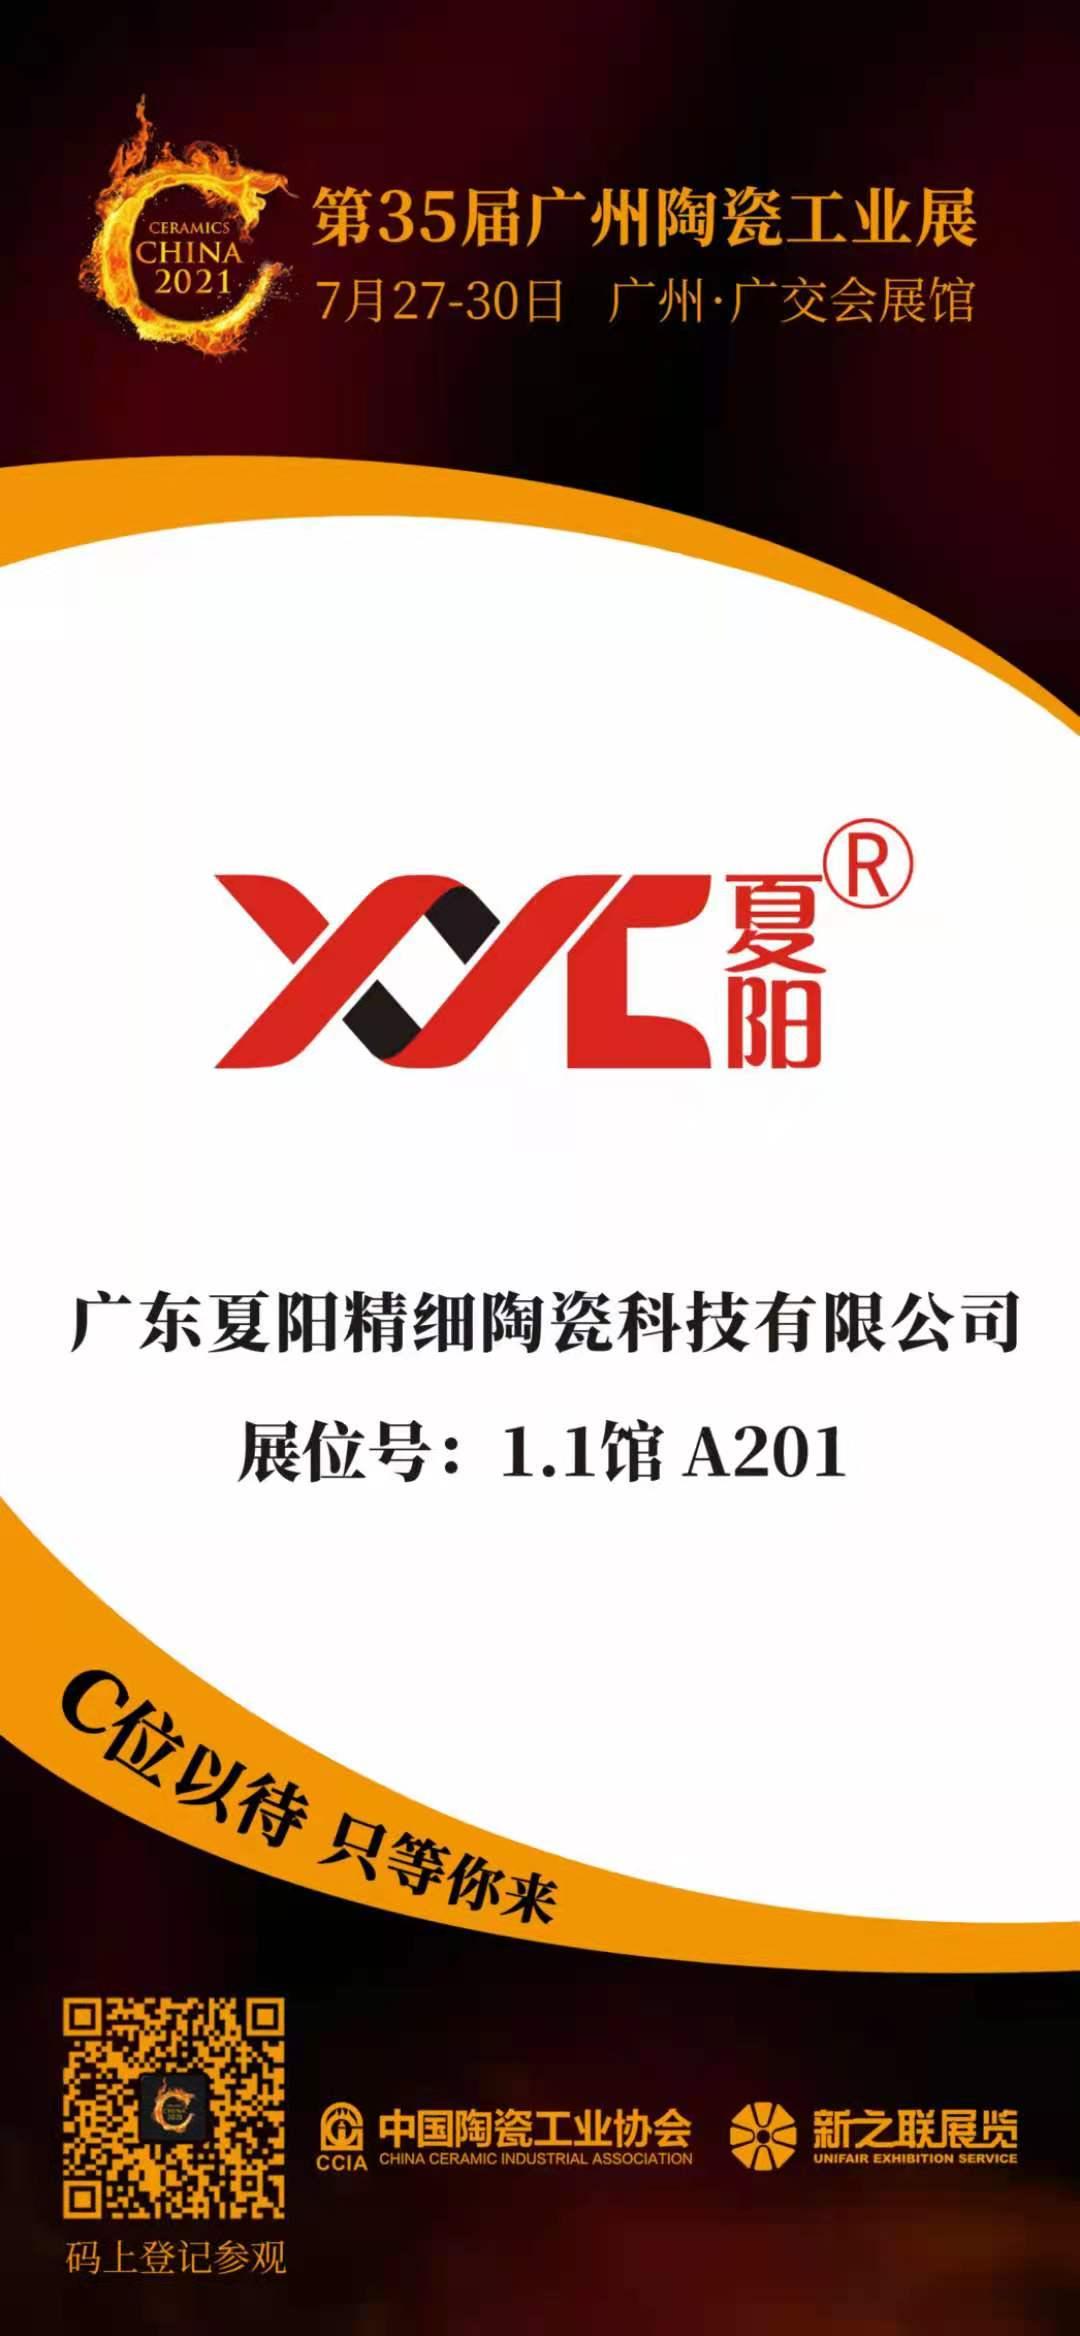 http://pmo51287a.pic36.websiteonline.cn/upload/c8c92a4a0565cb02551ab6f4048b7fe.jpg